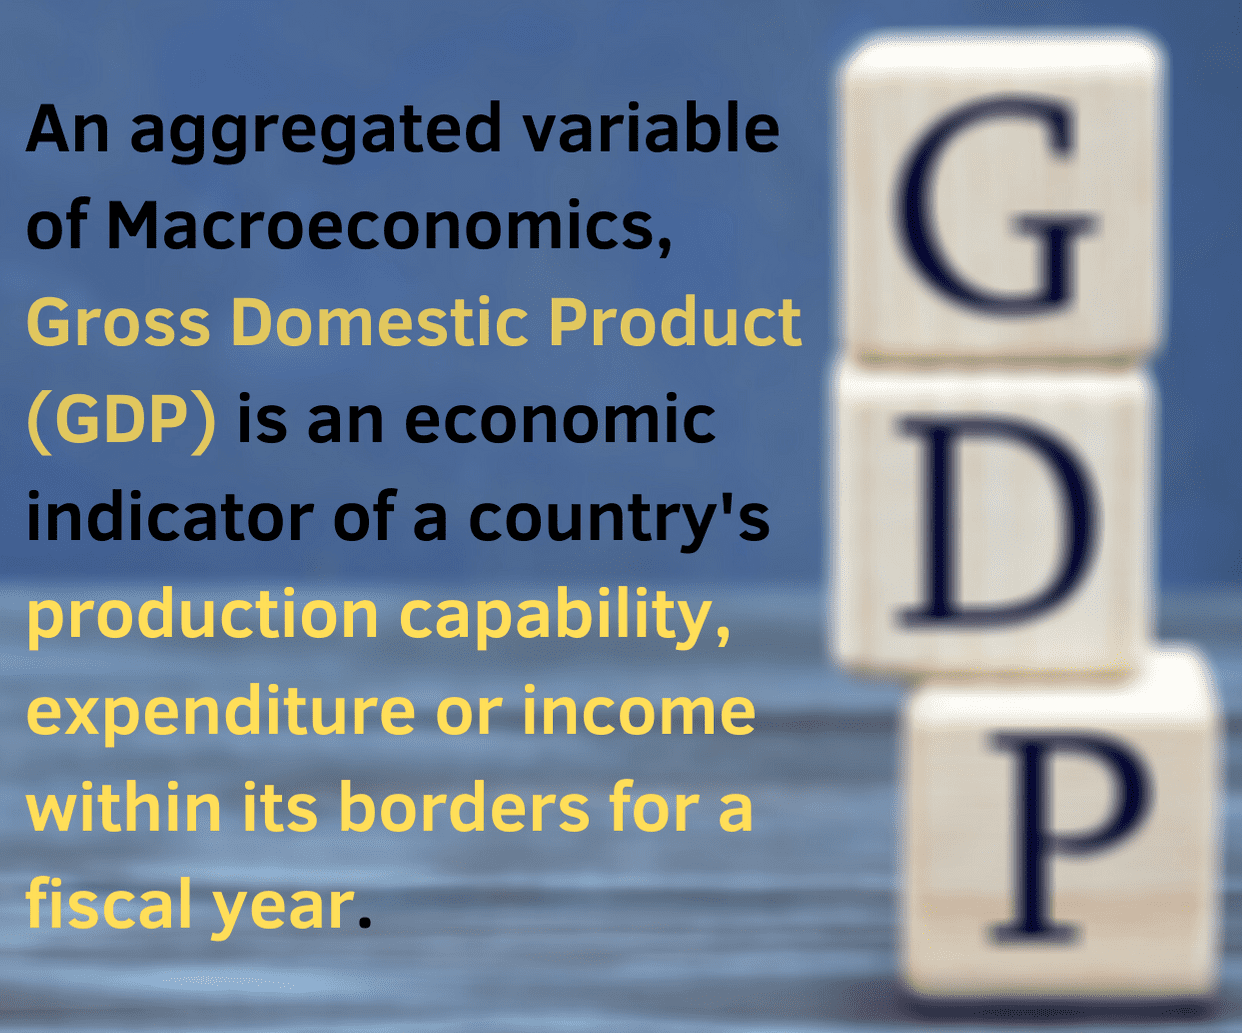 macroeconomics course fact 7